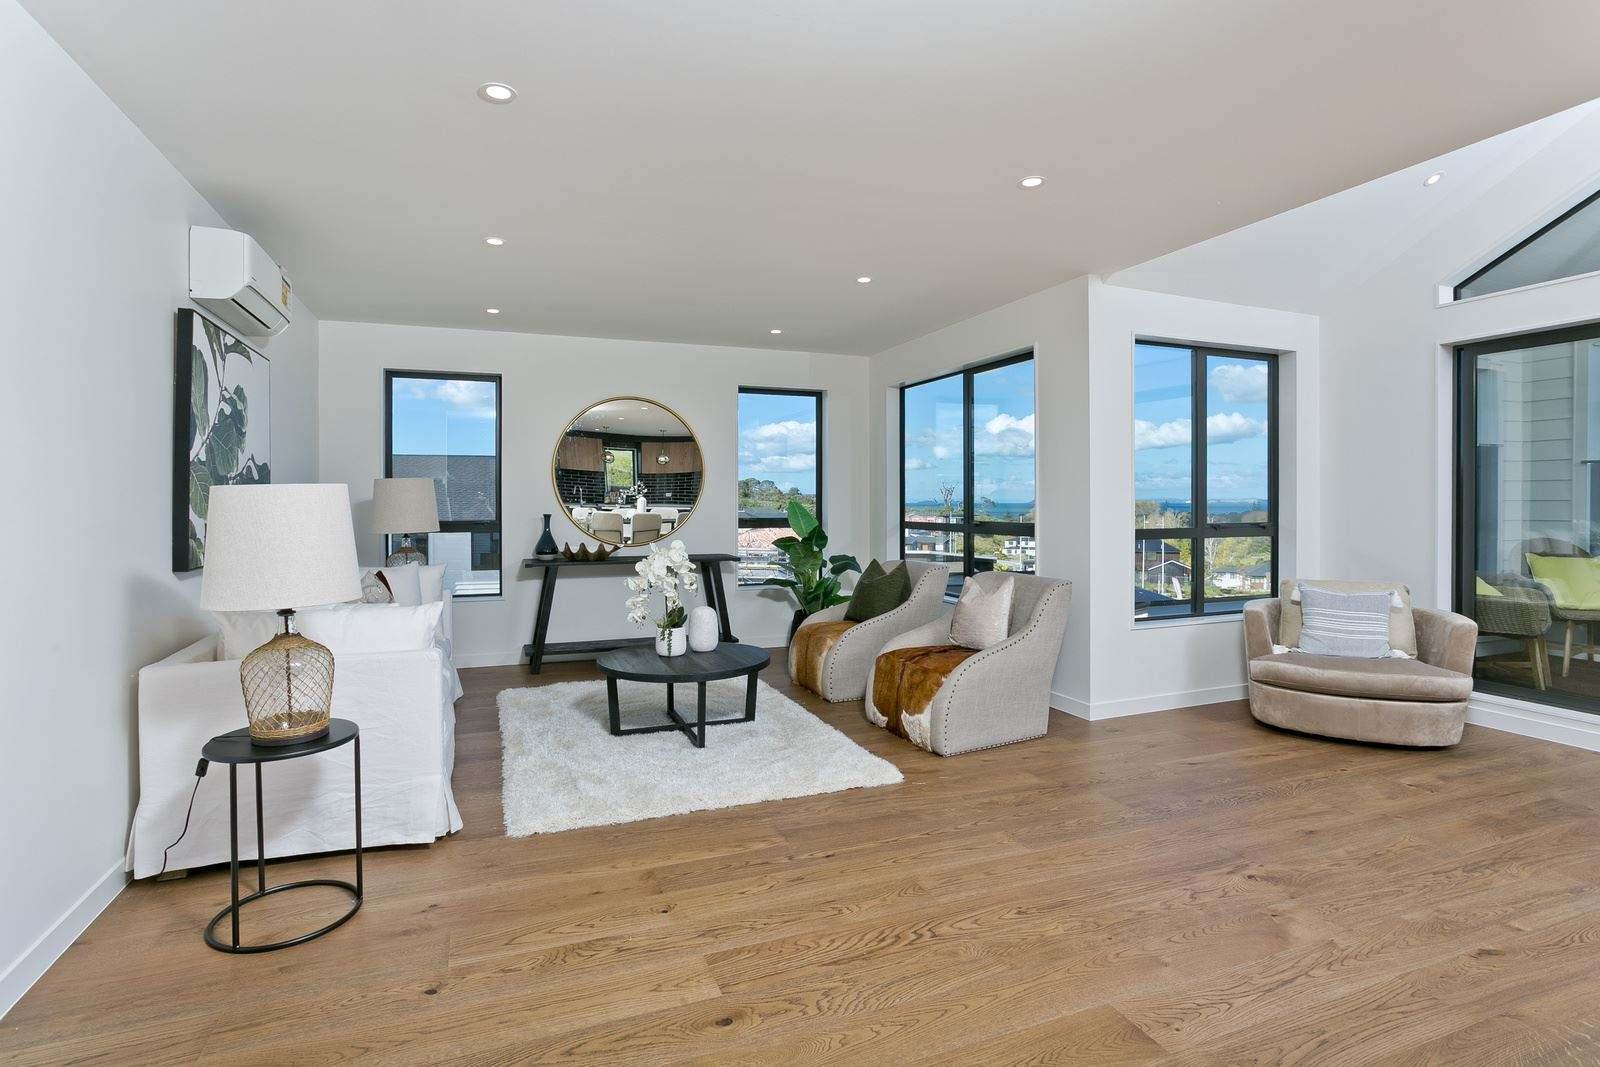 Long Bay 5房 全新两层家庭靓宅 采光一流 配套设施一应俱全 繁华商圈&海滩近距离 优质校网加持 享受惬意生活 Brand New - Executive Living Plus Views